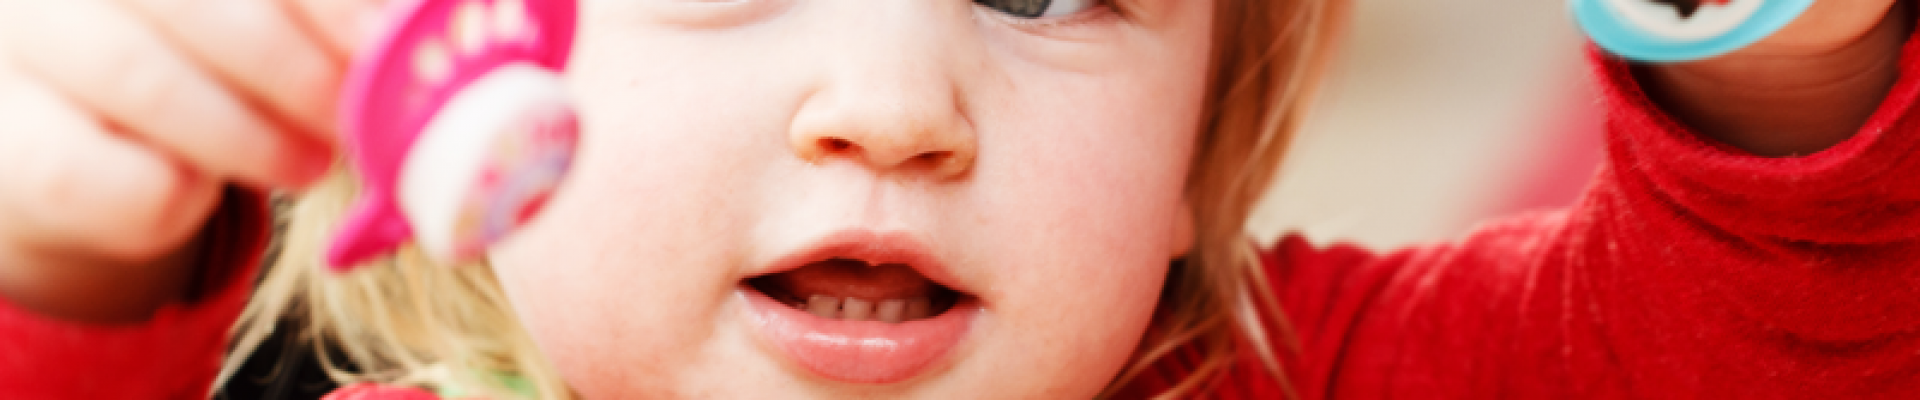 dentista-en-donostia-TETE-Blog-1